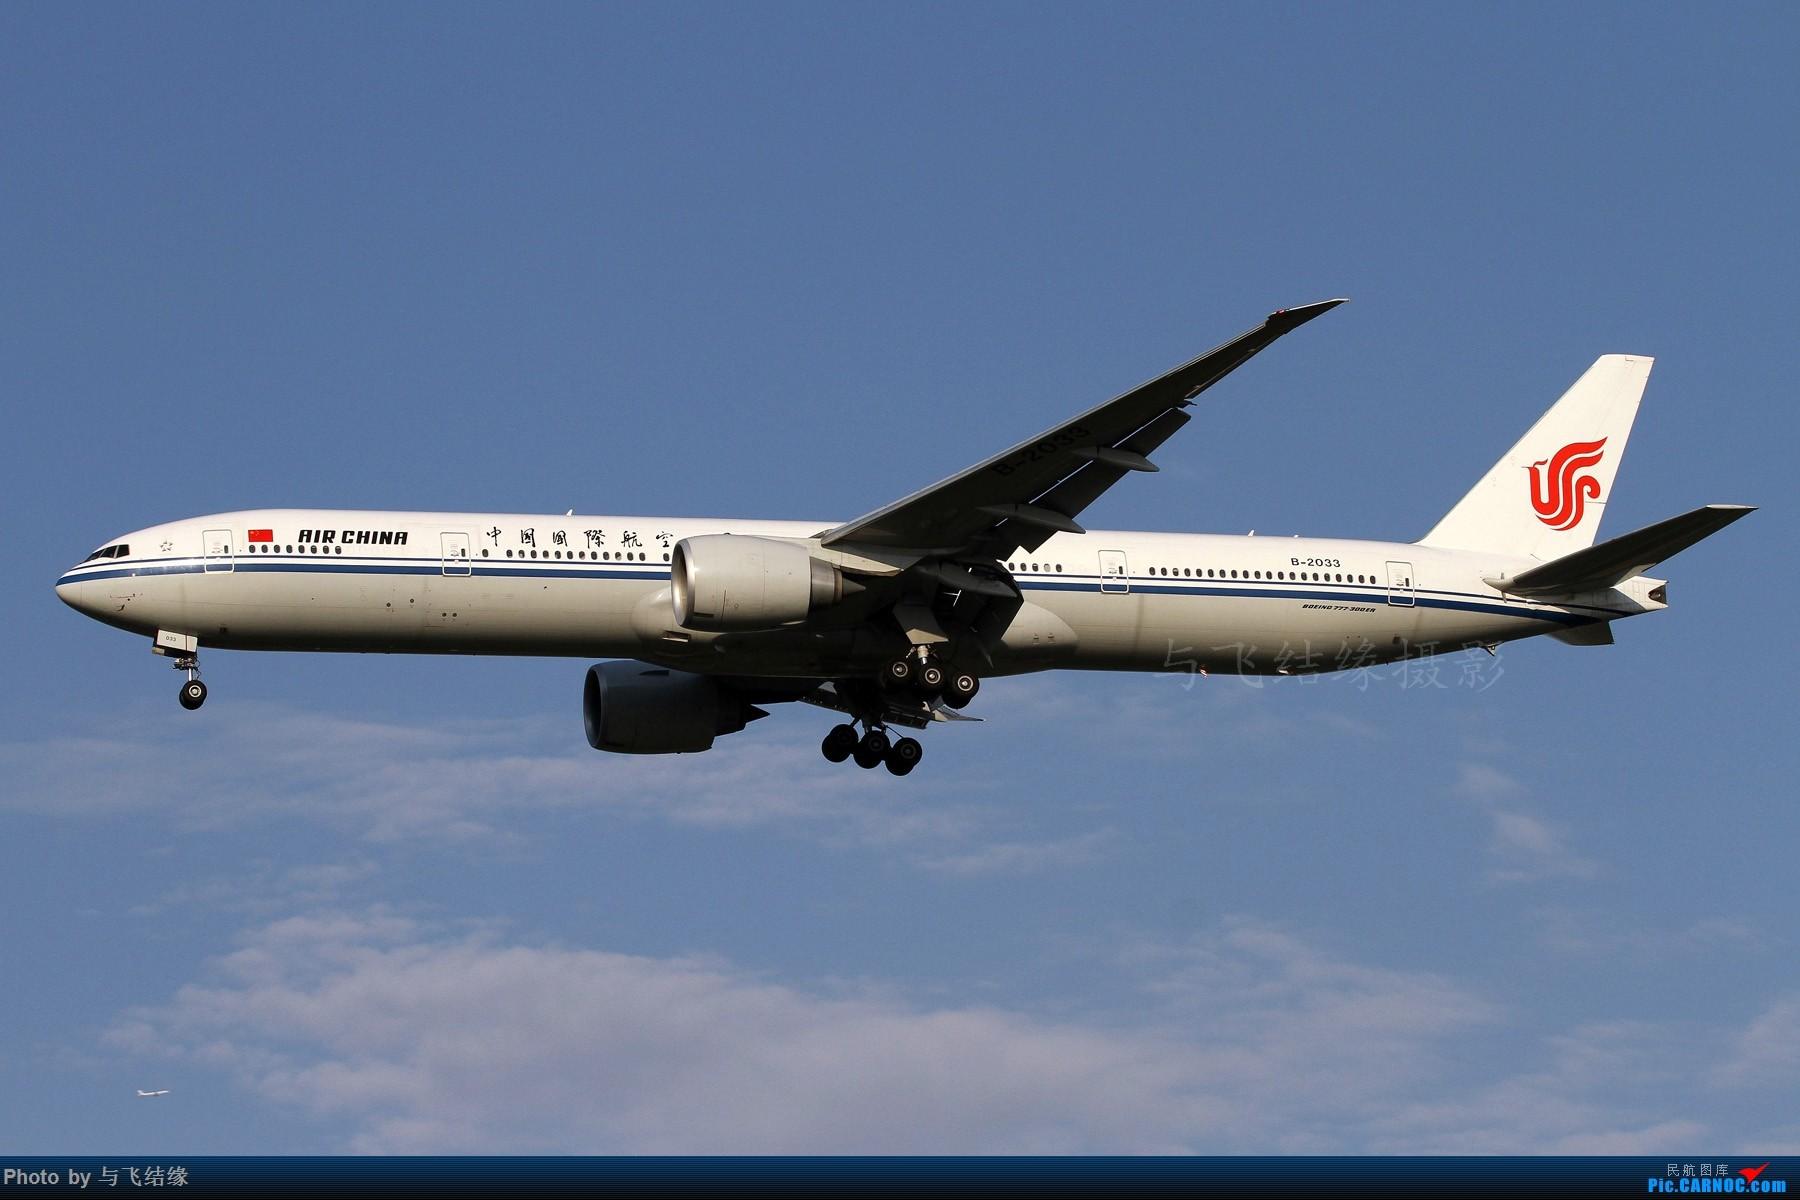 Re:元旦假期又是雾霾橙色预警天只好在家发图了近期的一些拙作! BOEING 777-300ER B-2033 中国北京首都国际机场